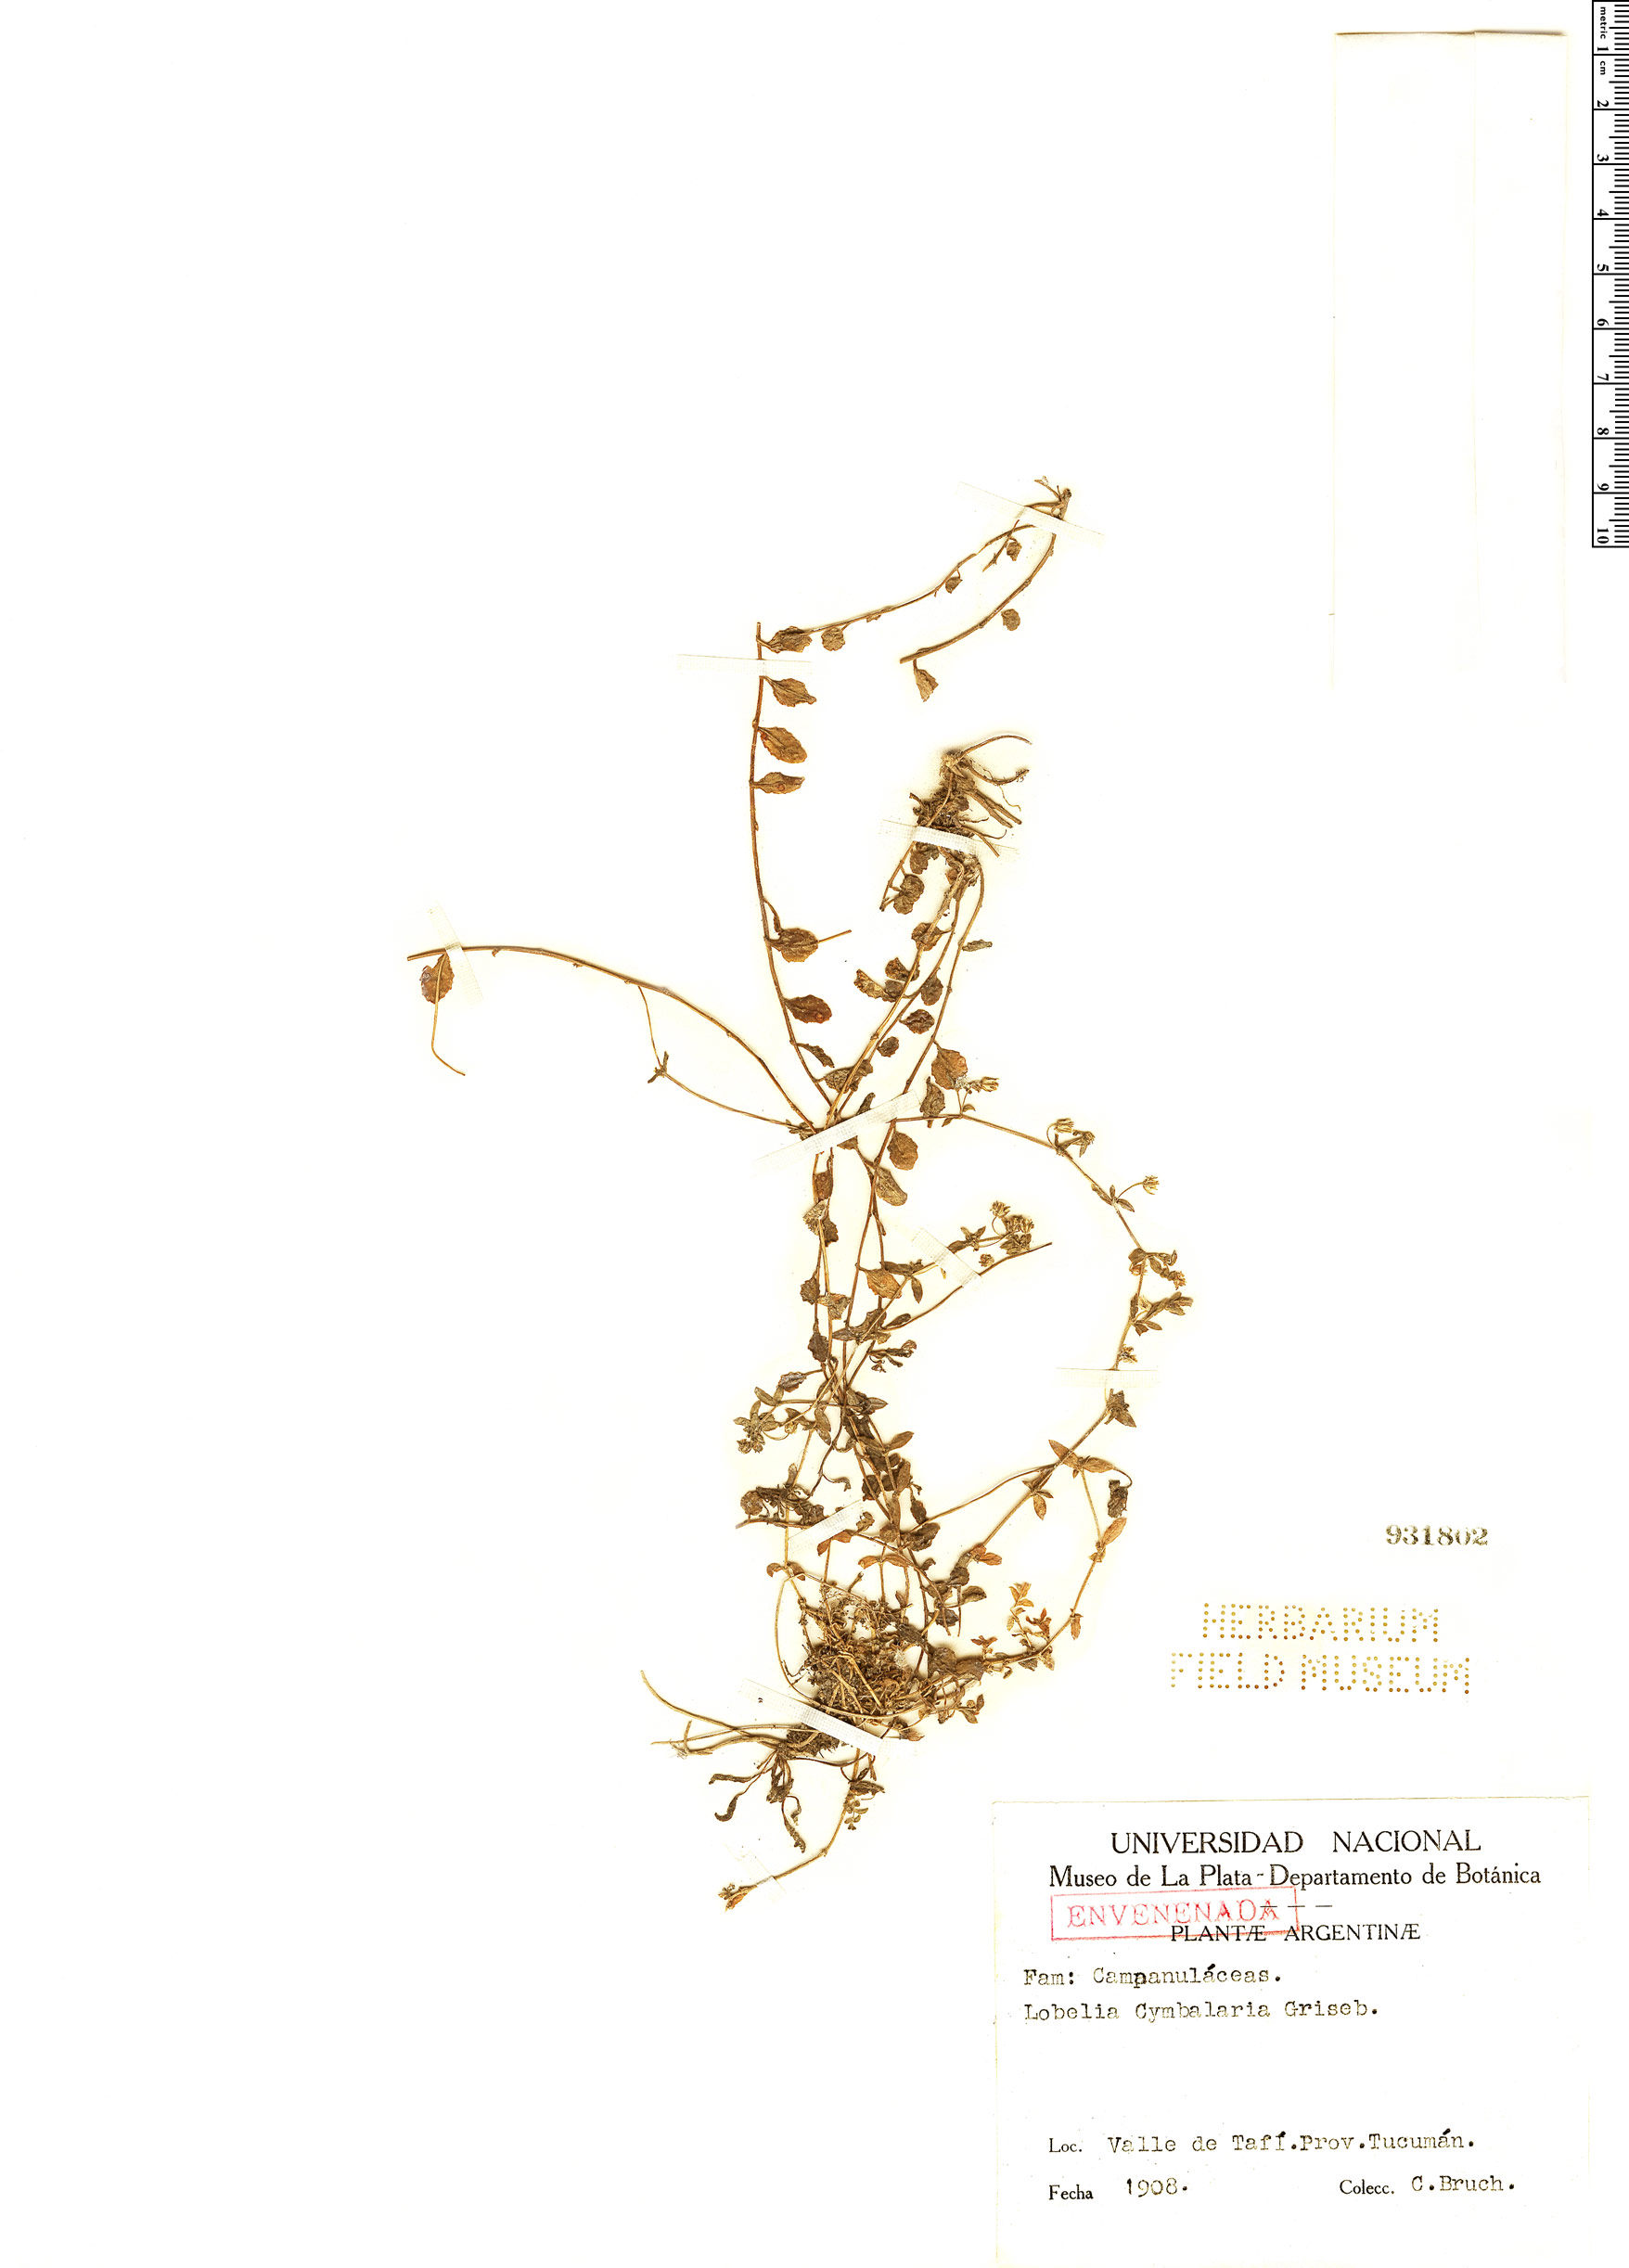 Specimen: Lobelia cymbalaria